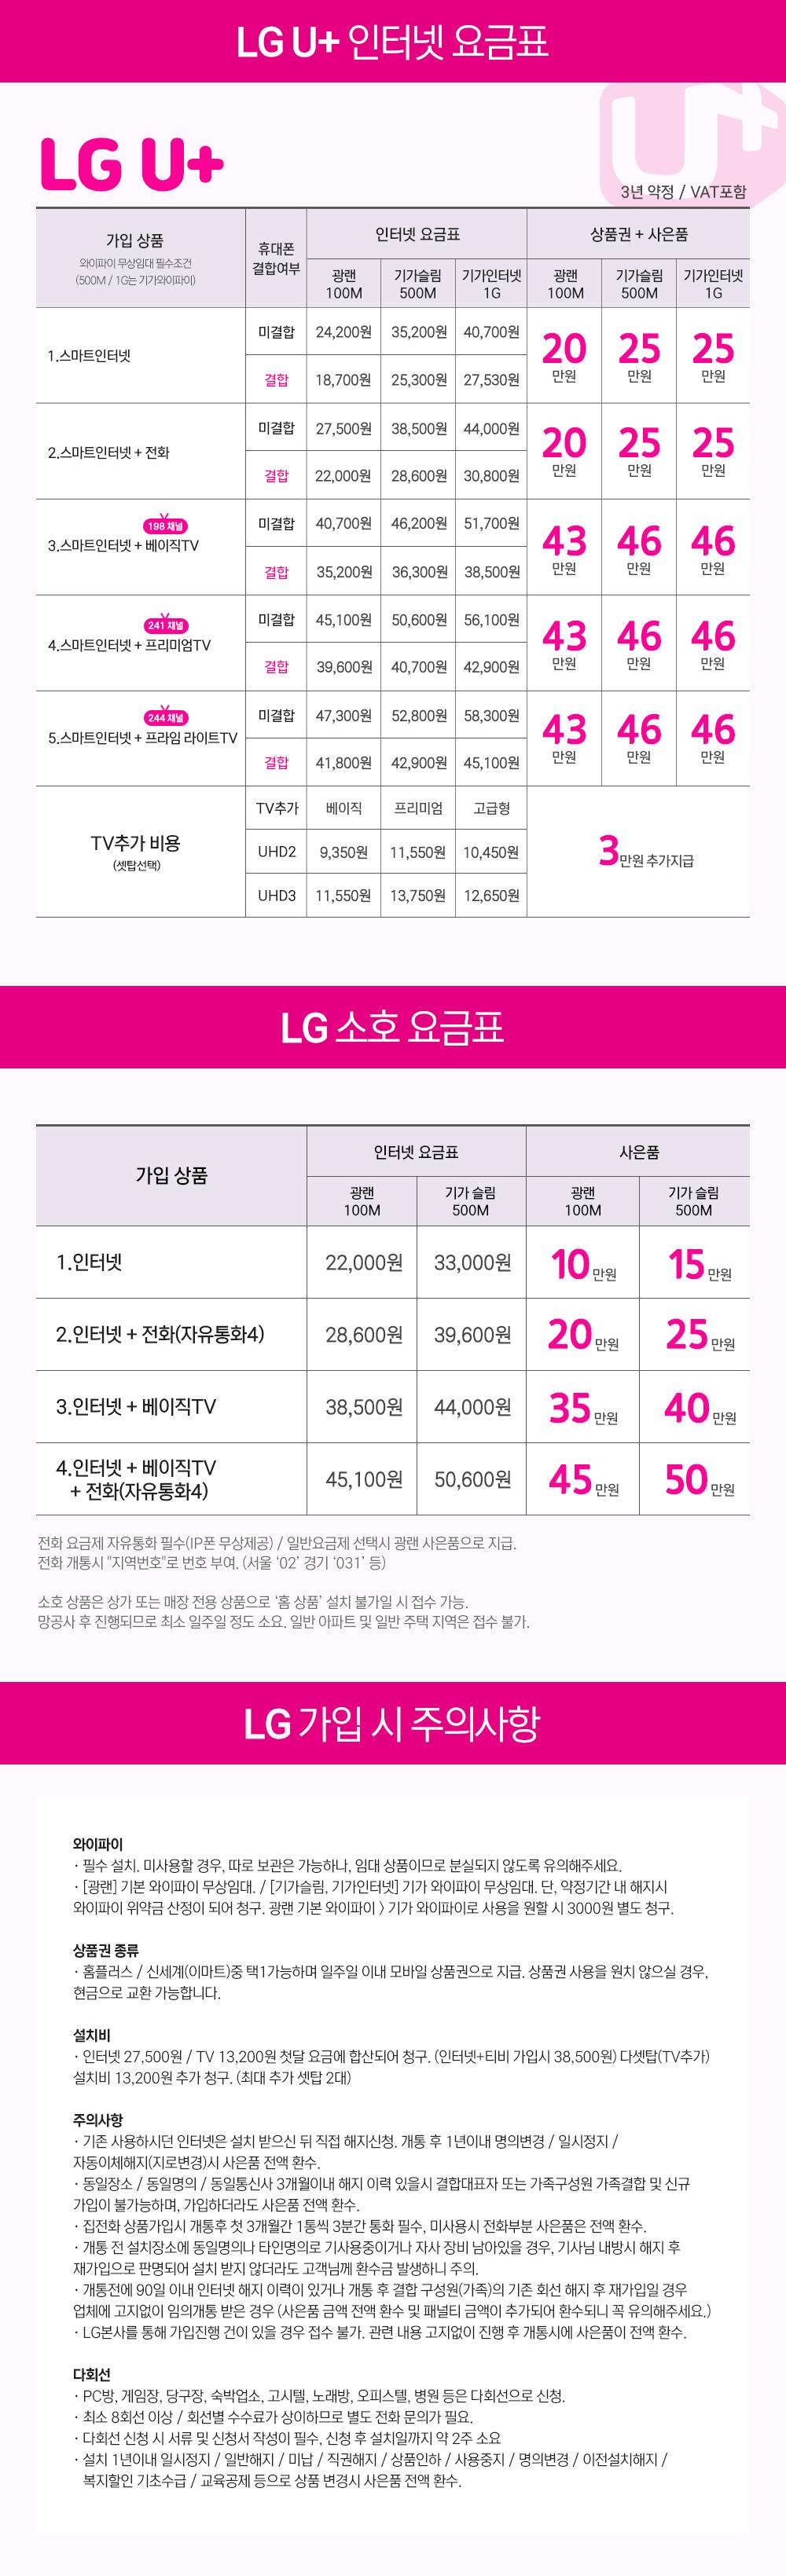 LG_2.png